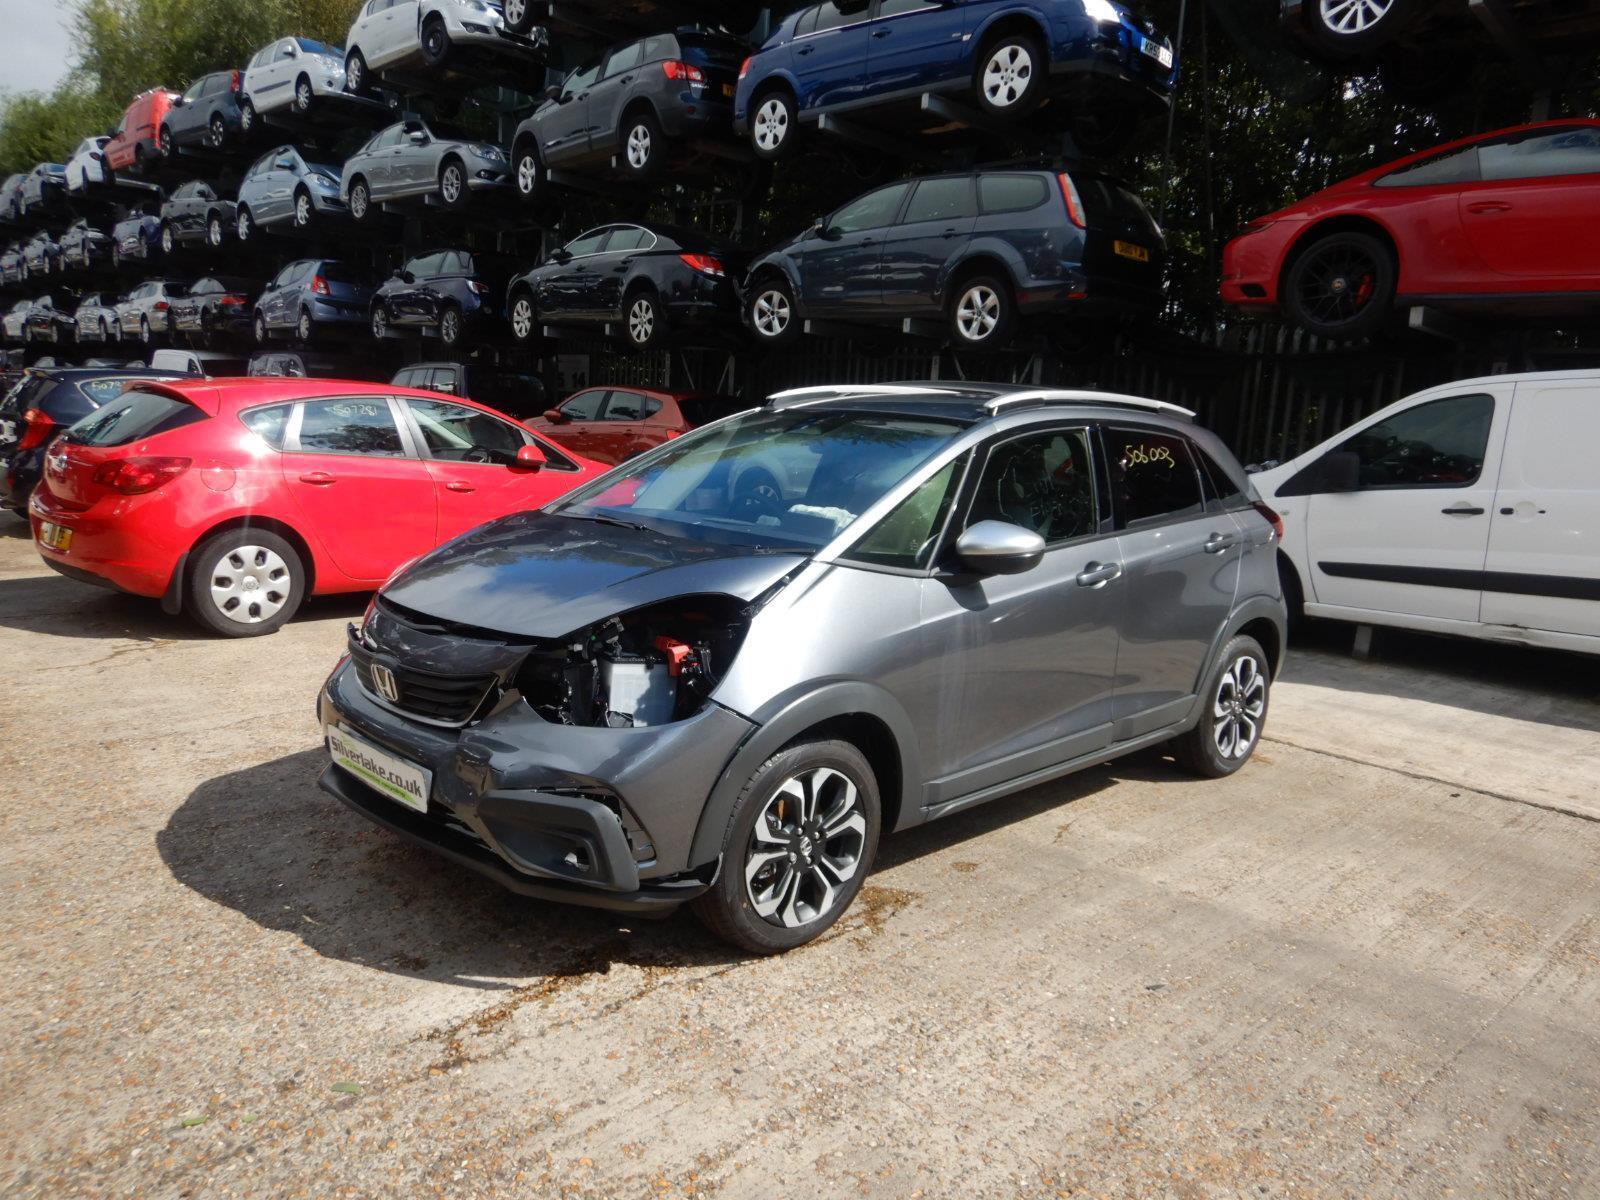 2021 Honda Jazz I-MMD CROSSTAR EX 1498cc Petrol/Electric CVT 1 Speed 5 Door Hatchback